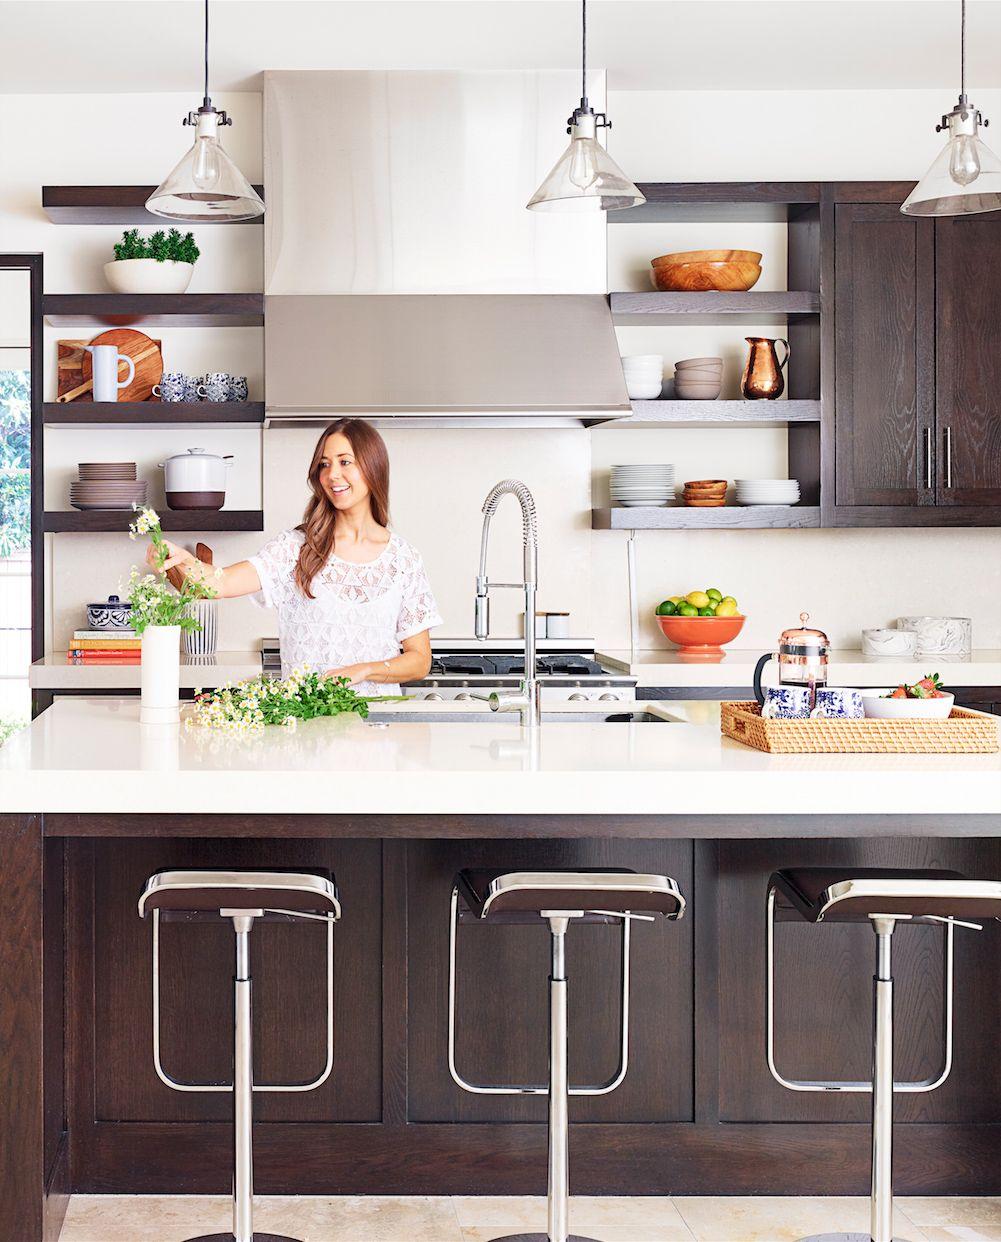 40+ Best Kitchen Ideas - Decor and Decorating Ideas for Kitchen Design